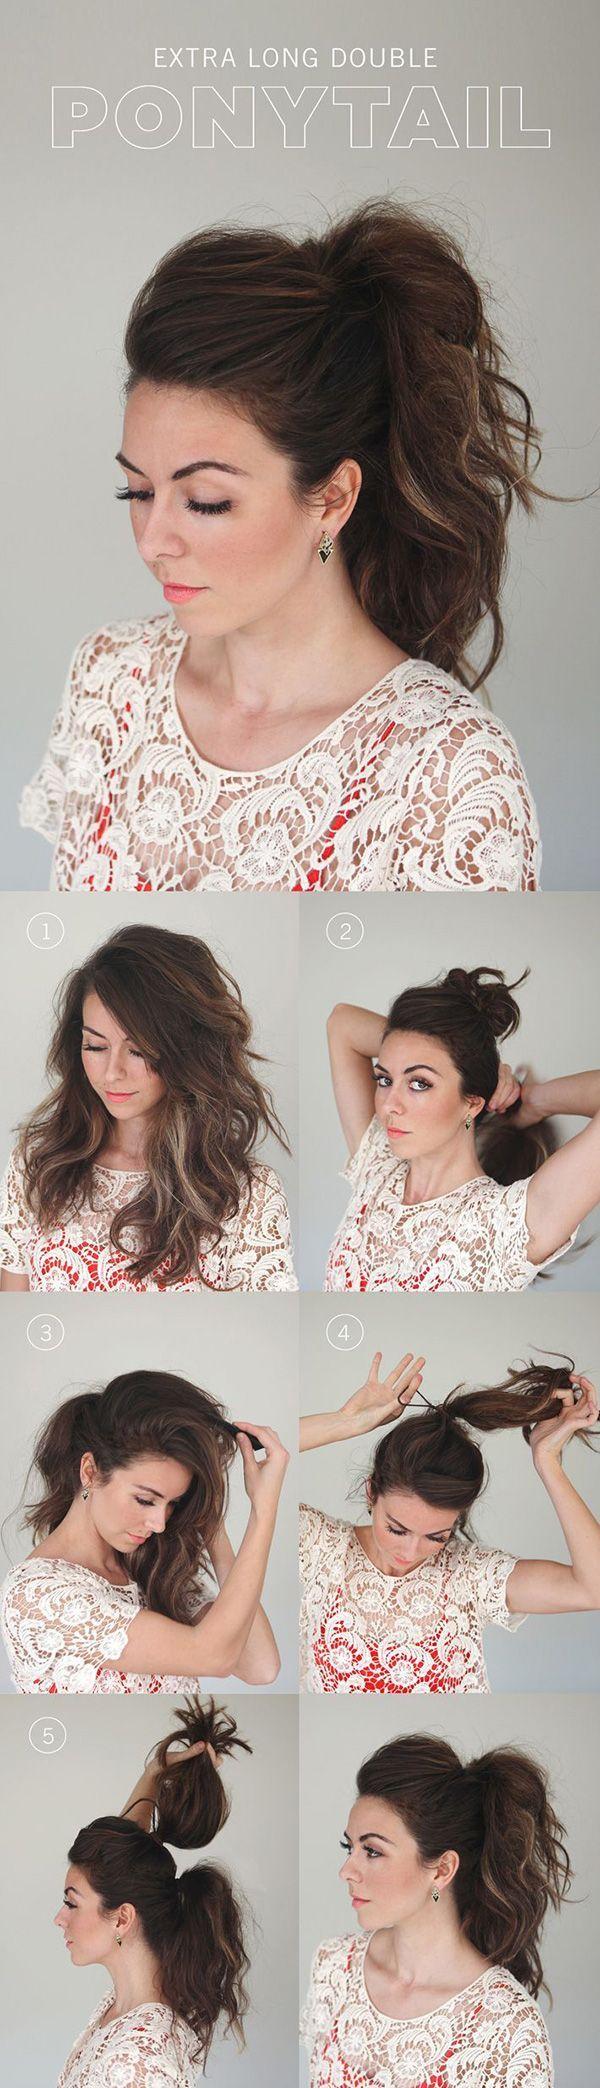 ponytail ideas...